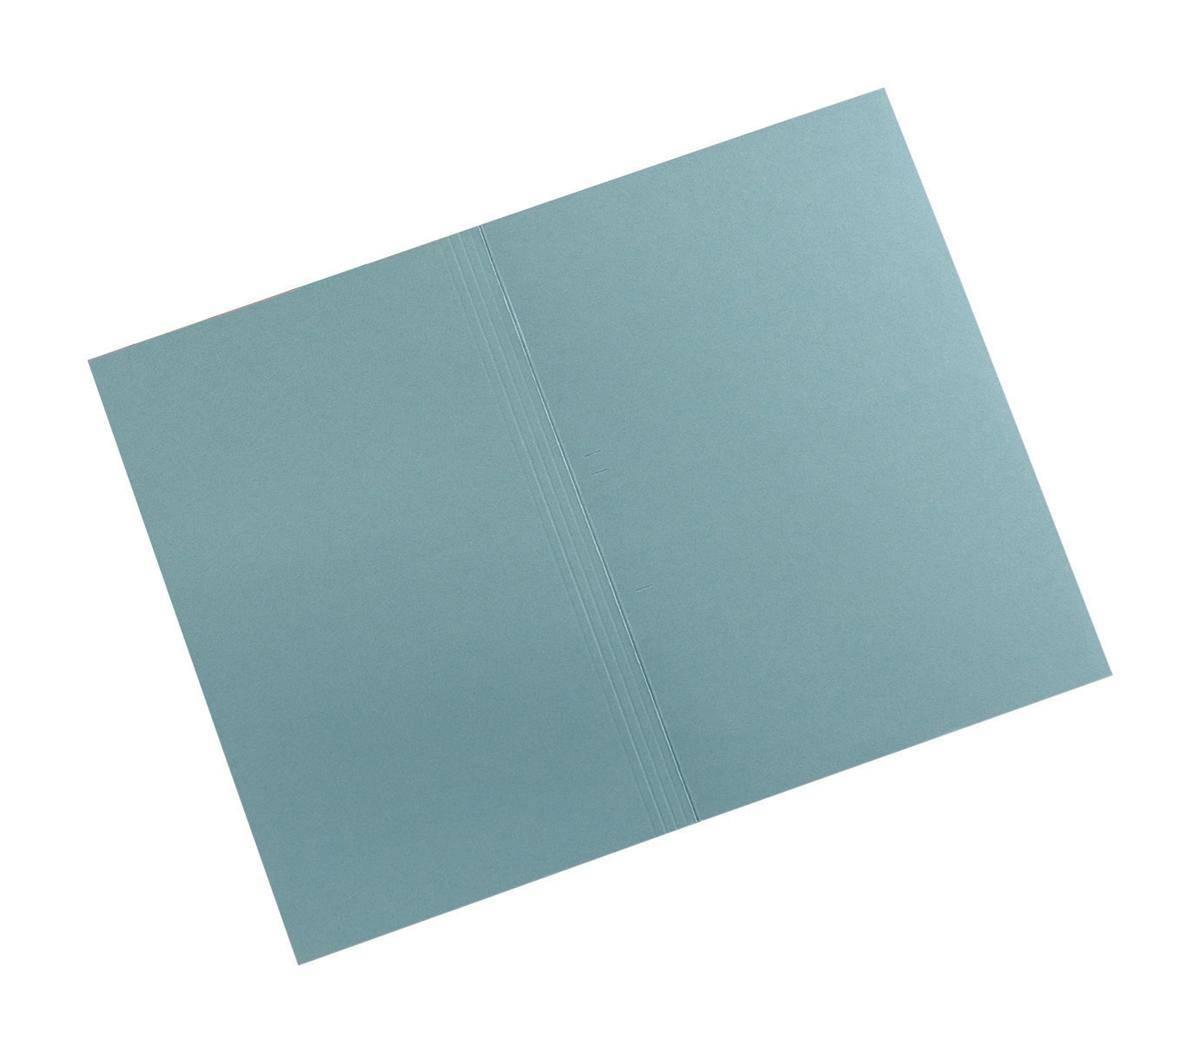 Guildhall Square Cut Folders Manilla 315gsm Foolscap Blue Ref FS315-BLUZ [Pack 100]